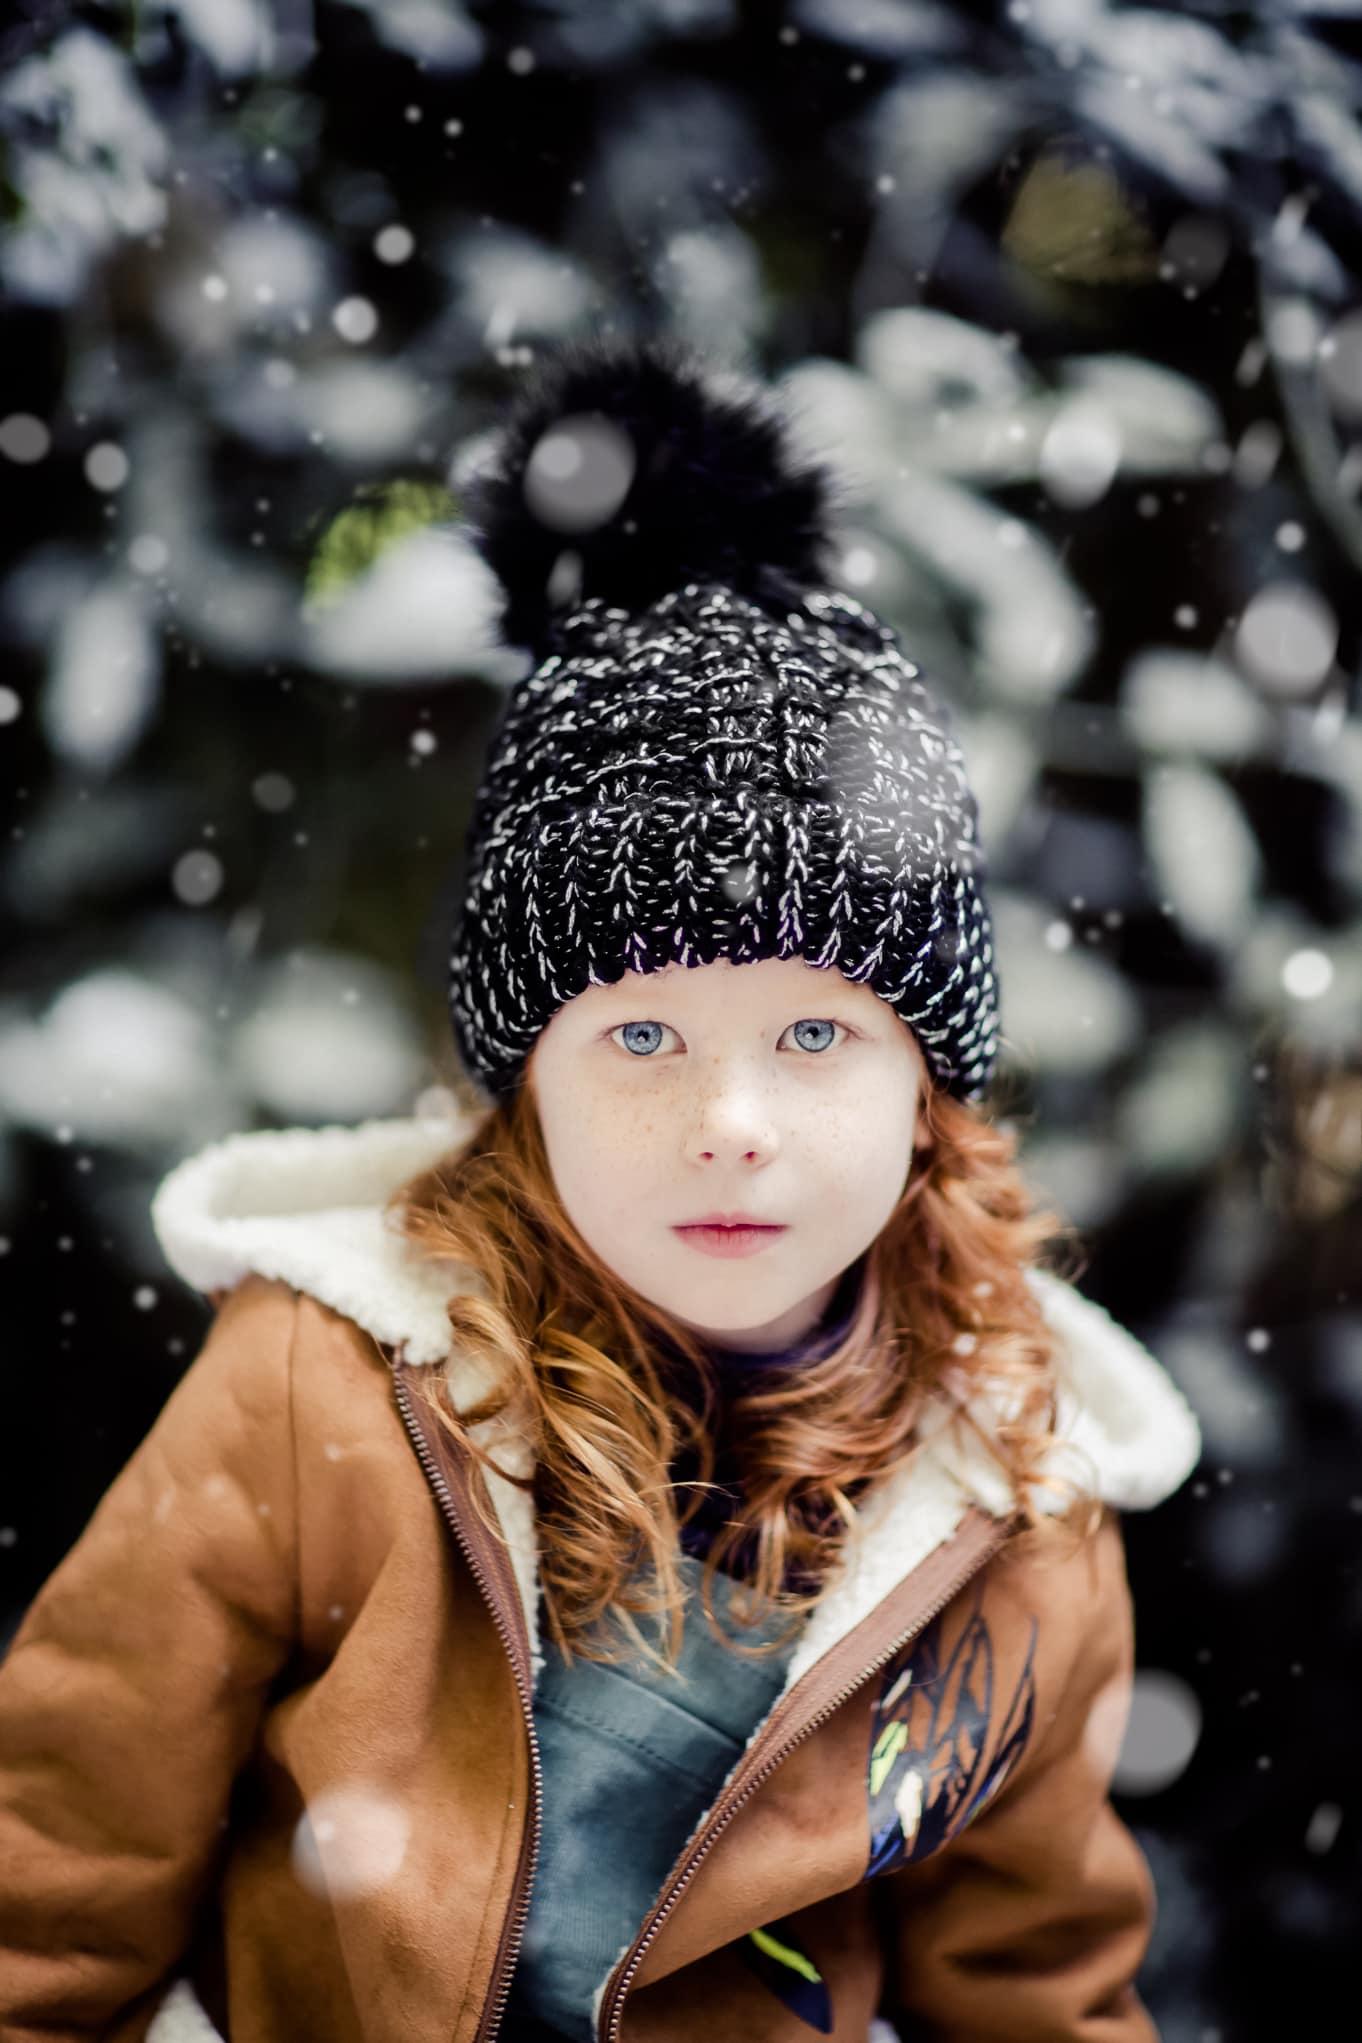 28-PLEASECREDIT-EddieJuddPhotography-PierreCarrStyling-NORDIC-FASHION-SCREENREADY